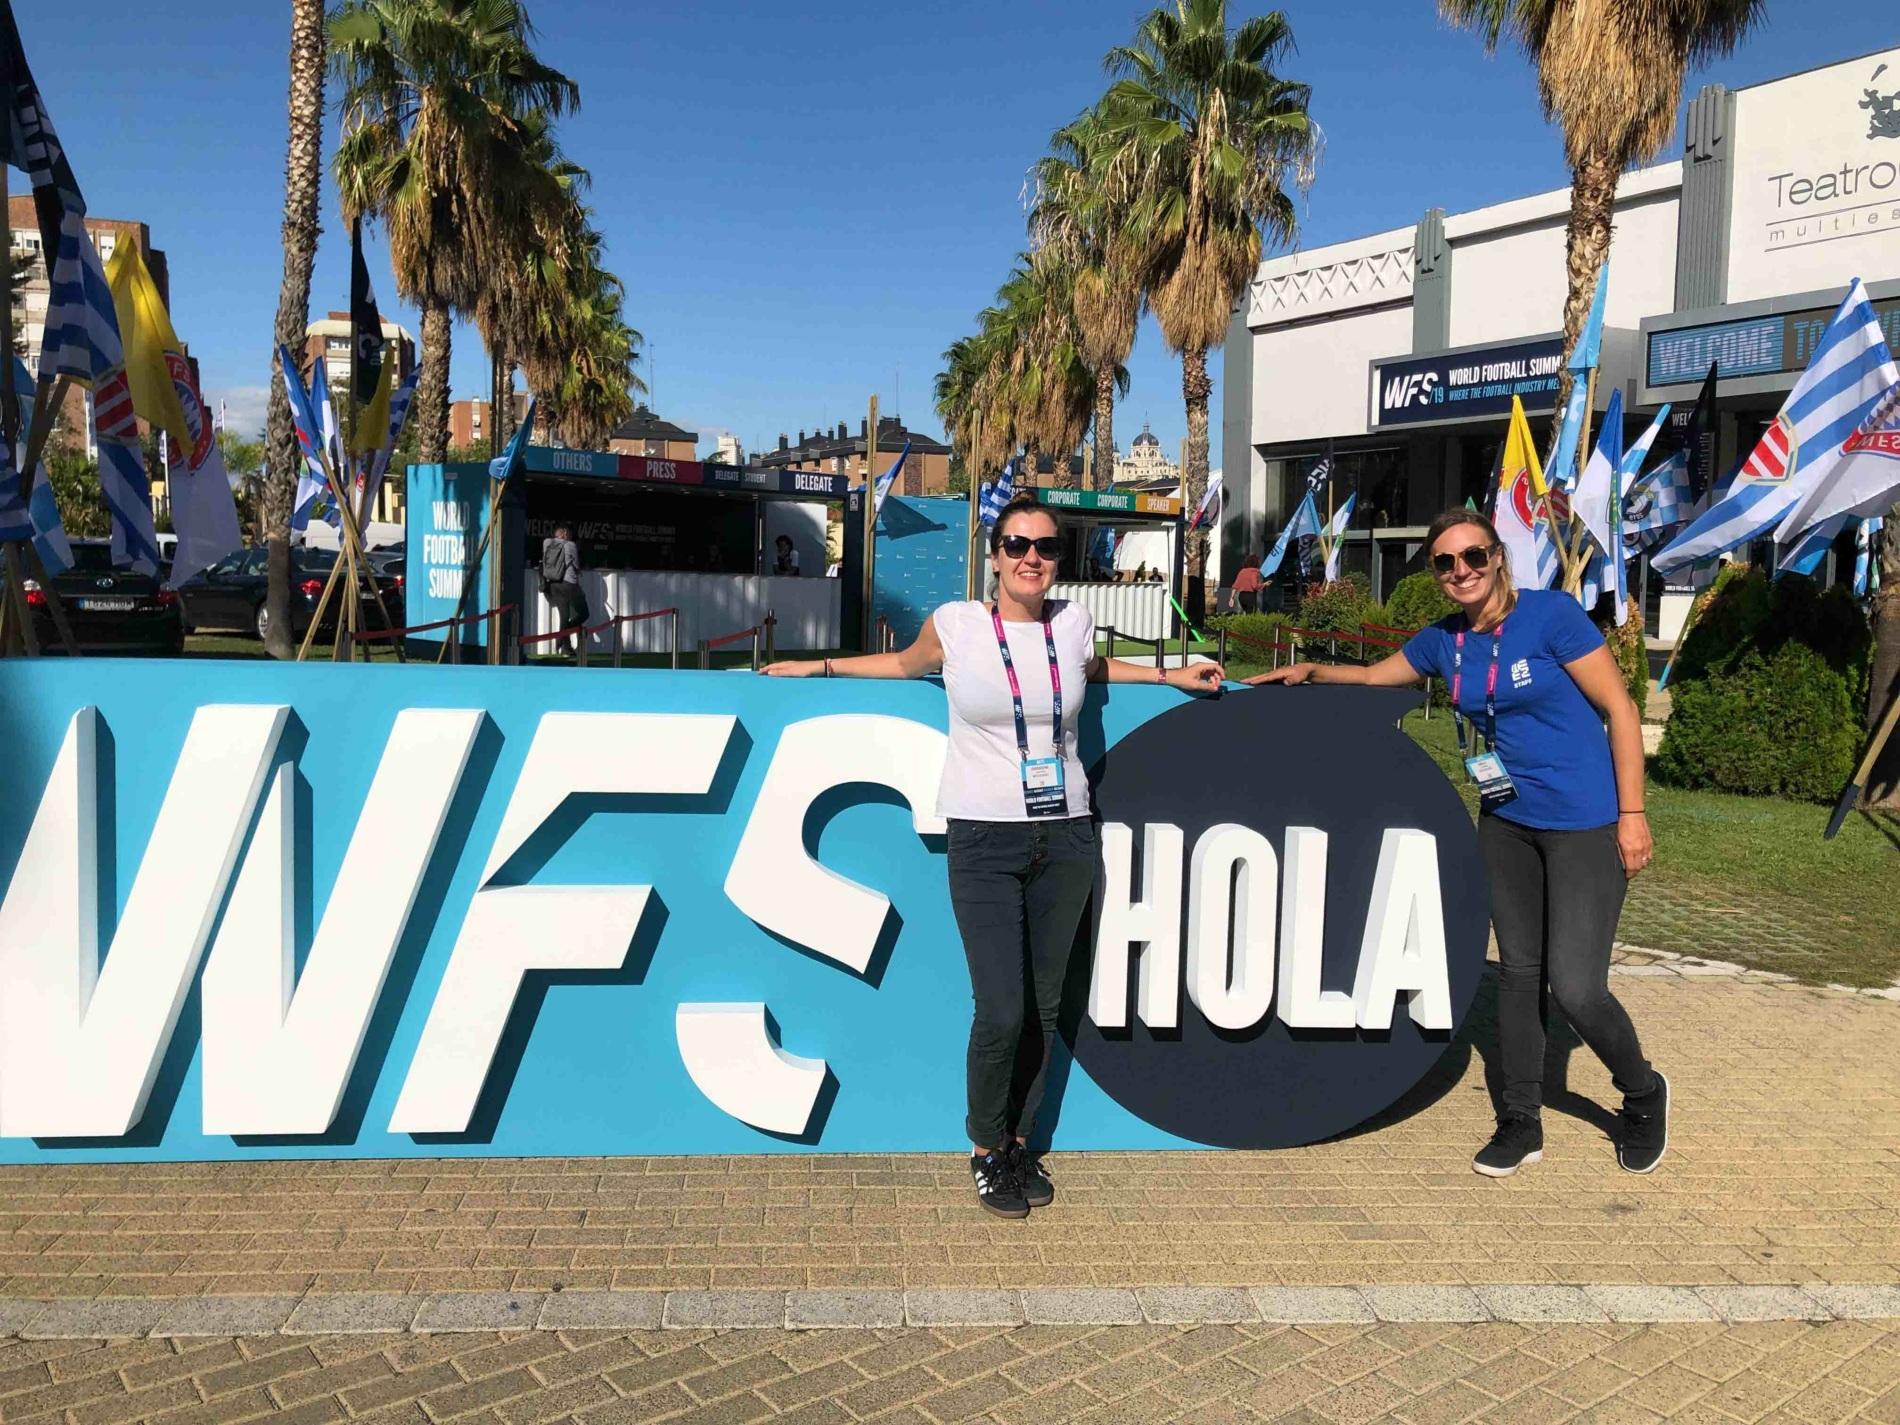 World Football Summit Madrid: La gran cita de la industria del fútbol